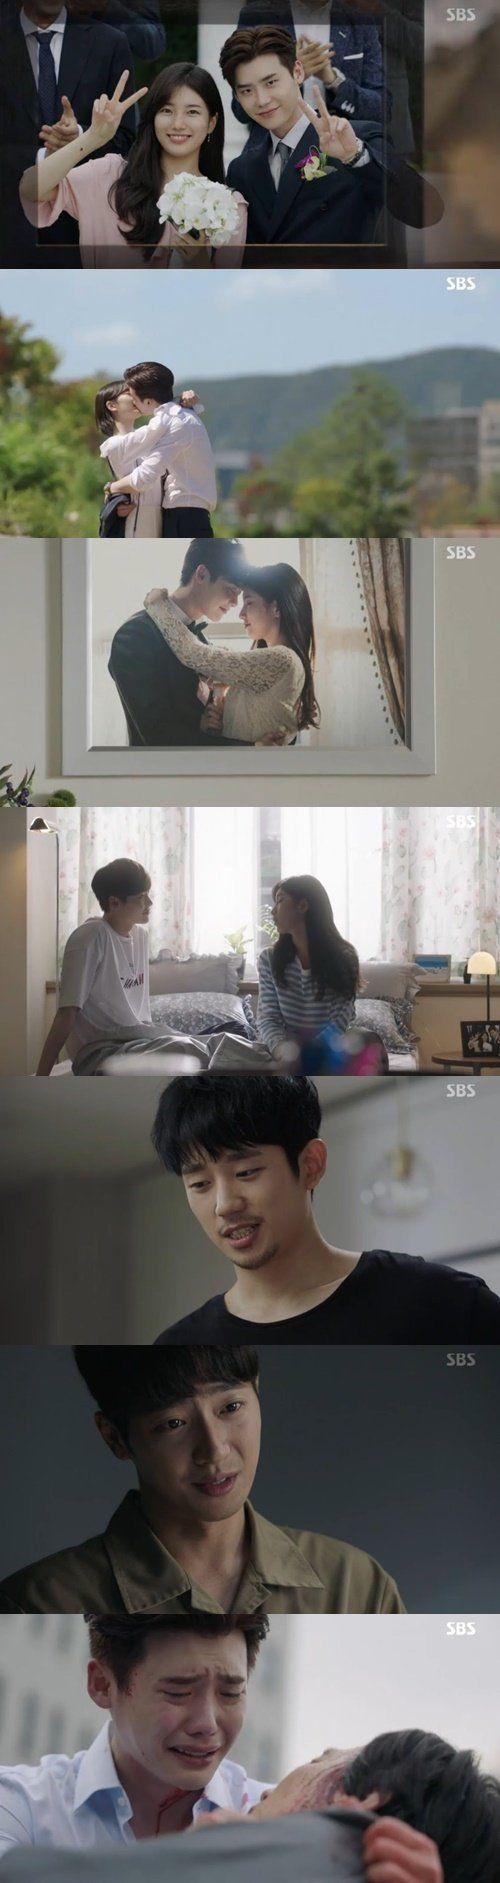 "[Spoiler] ""While You Were Sleeping - 2017"" Lee Jong-suk and Suzy get happy ending, Lee Sang-yeob gets life sentence"